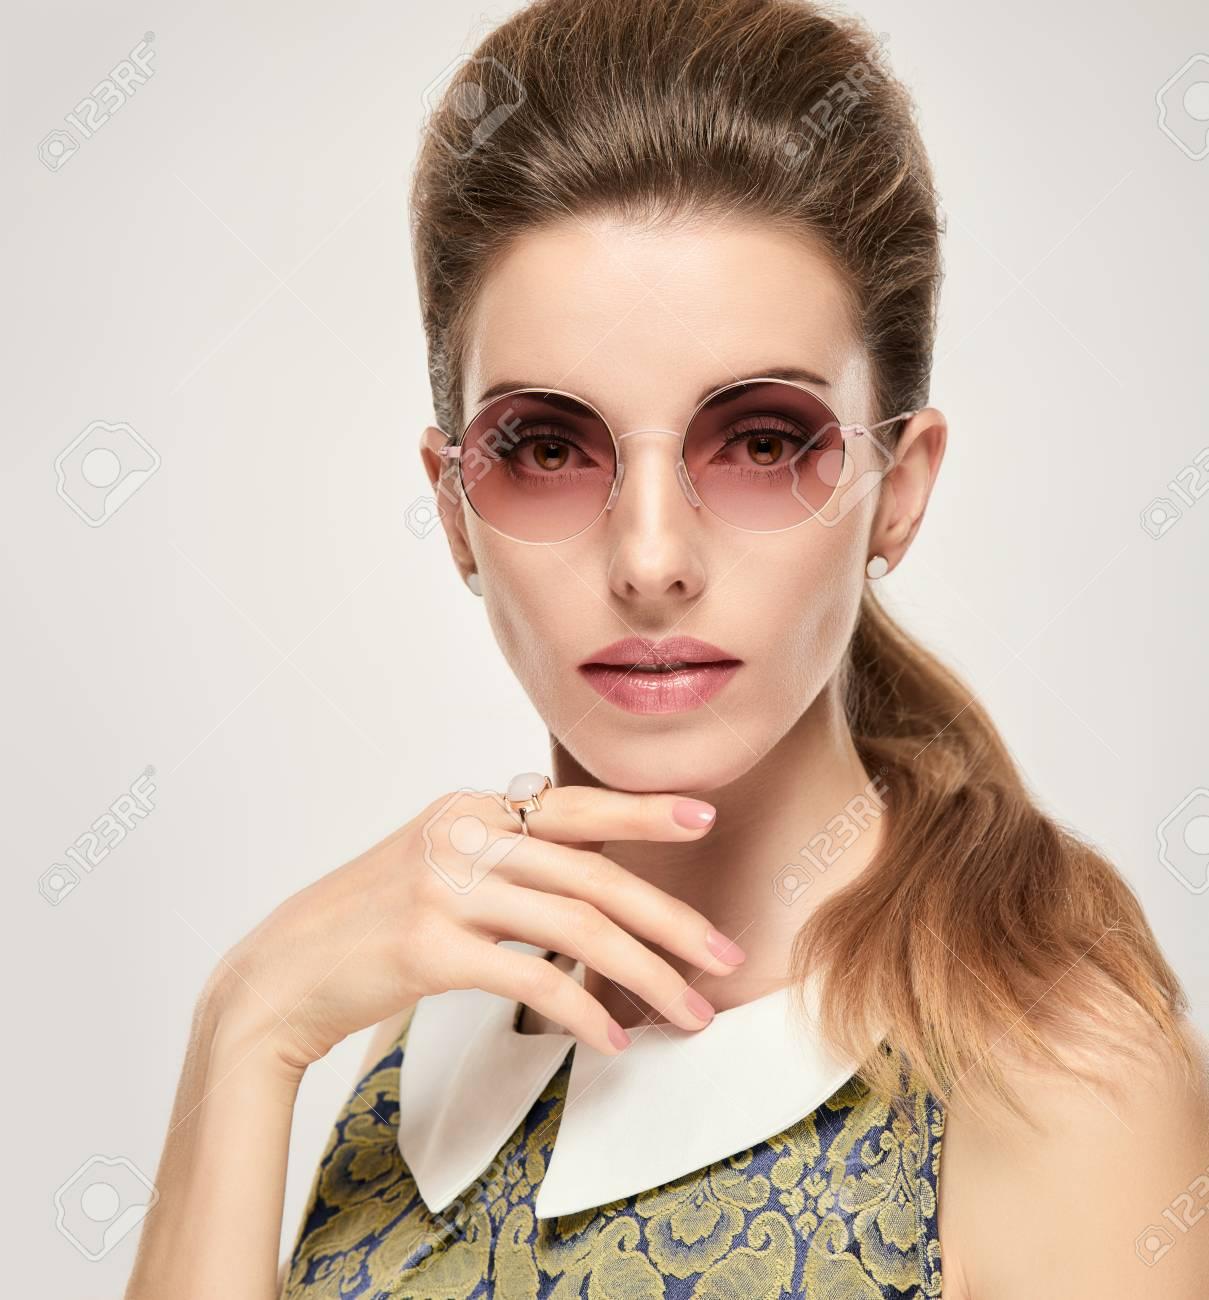 b6888447daa1 Beautiful Lady In Elegant Dress. Fashion Young Woman